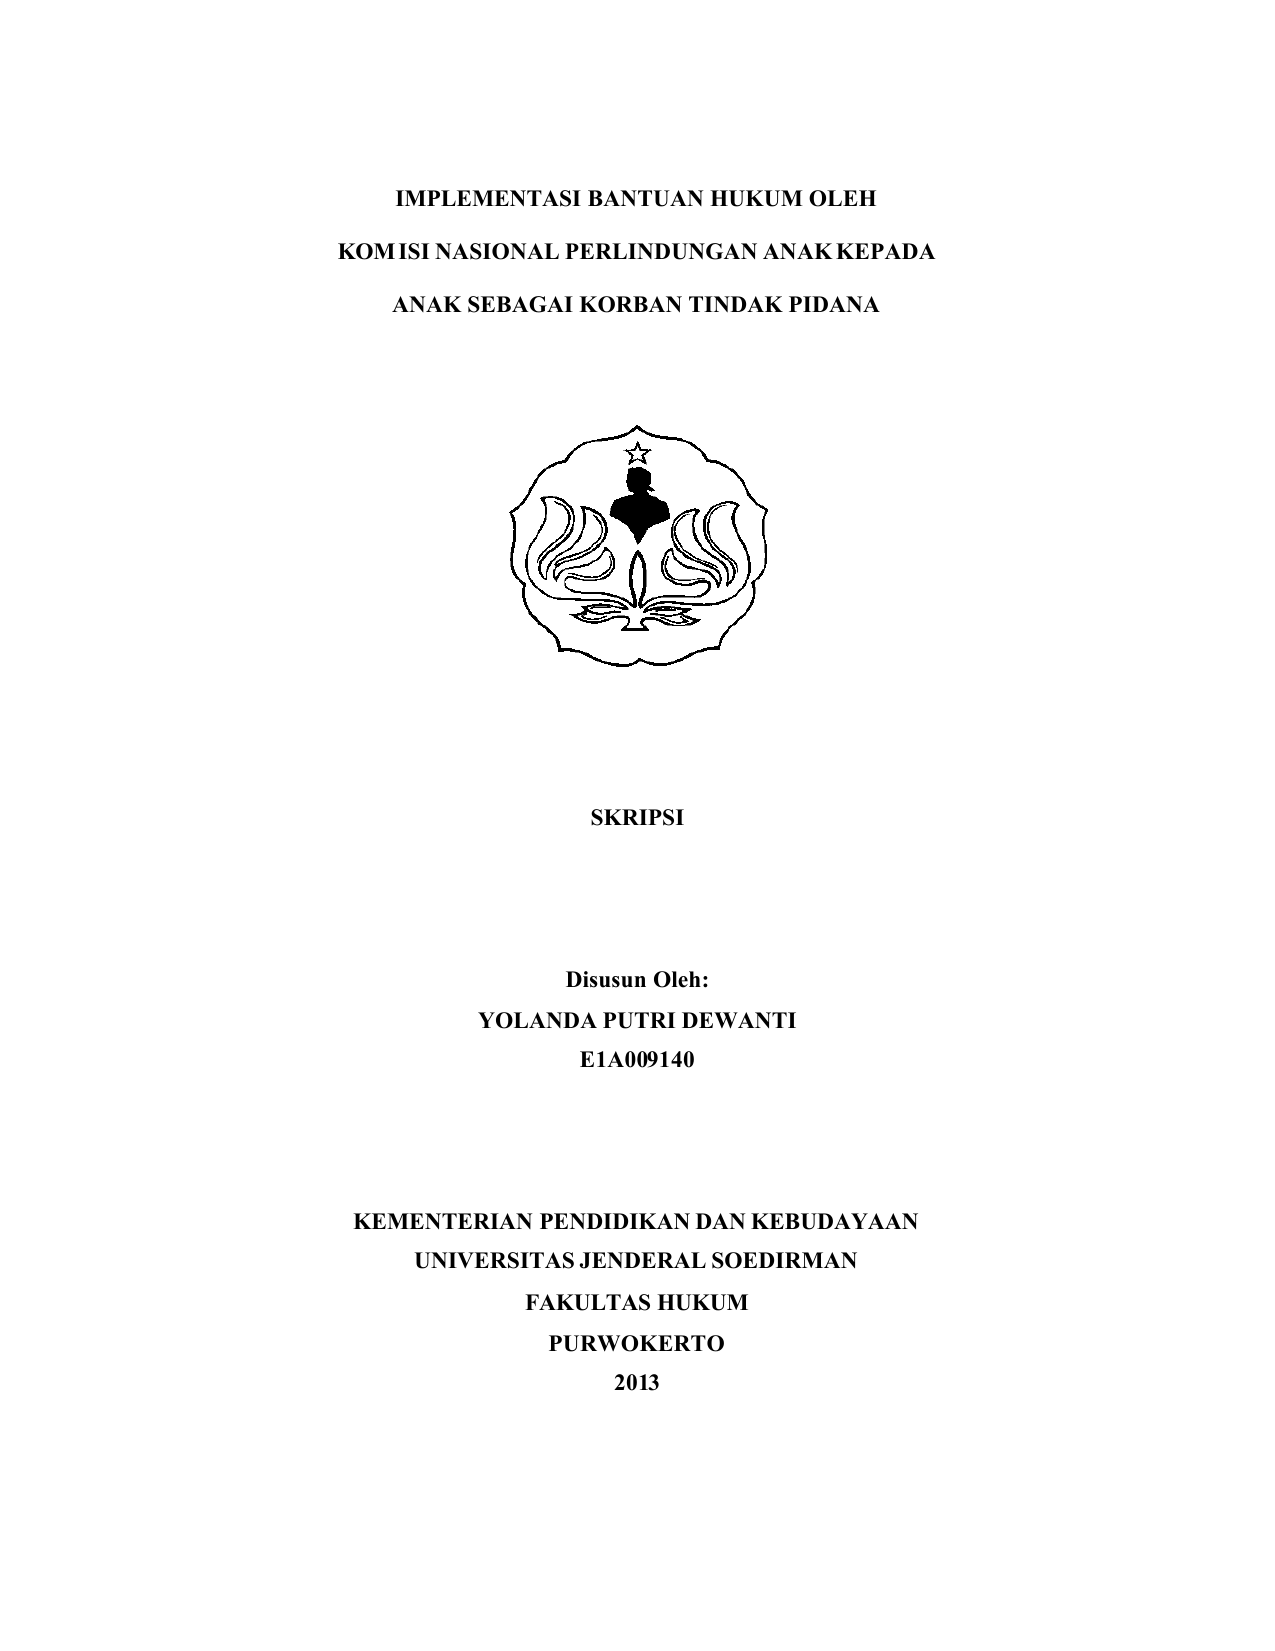 Skripsi E1a009140 Fakultas Hukum Unsoed